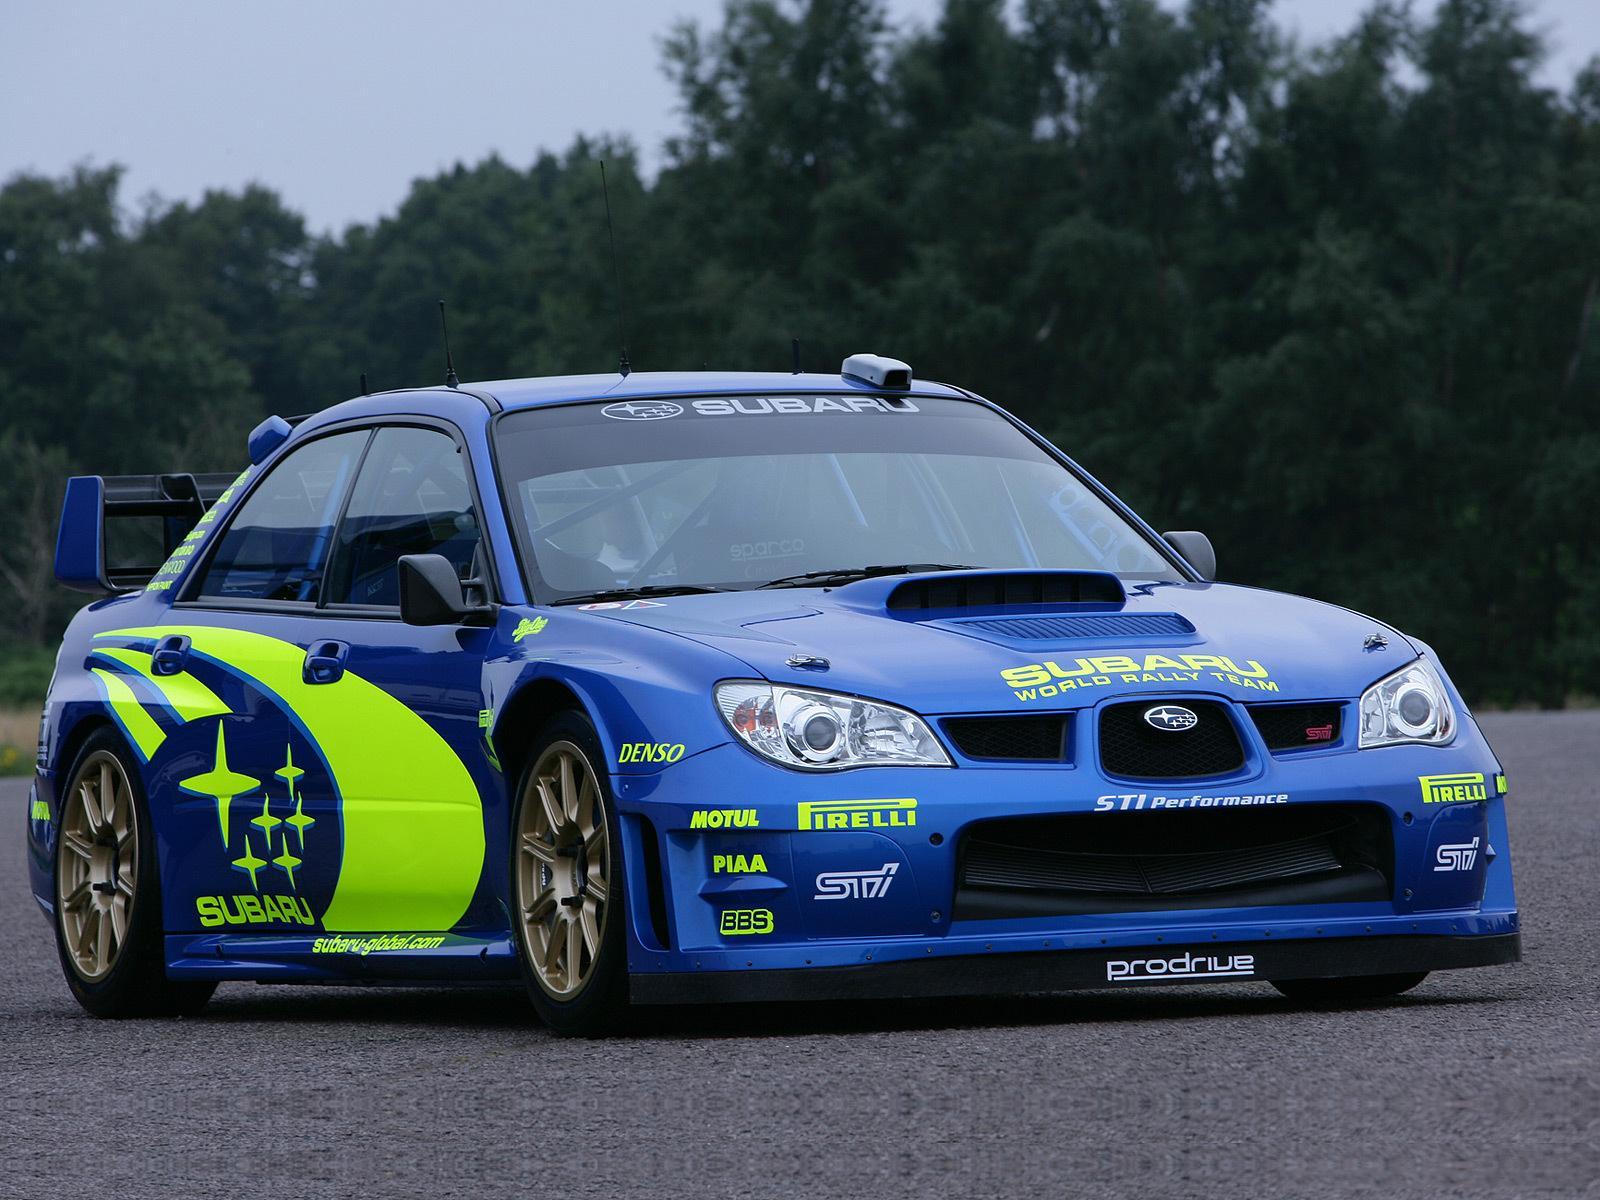 Subaru Impreza 2018 Tuning >> Subaru Impreza WRC photos - PhotoGallery with 38 pics| CarsBase.com